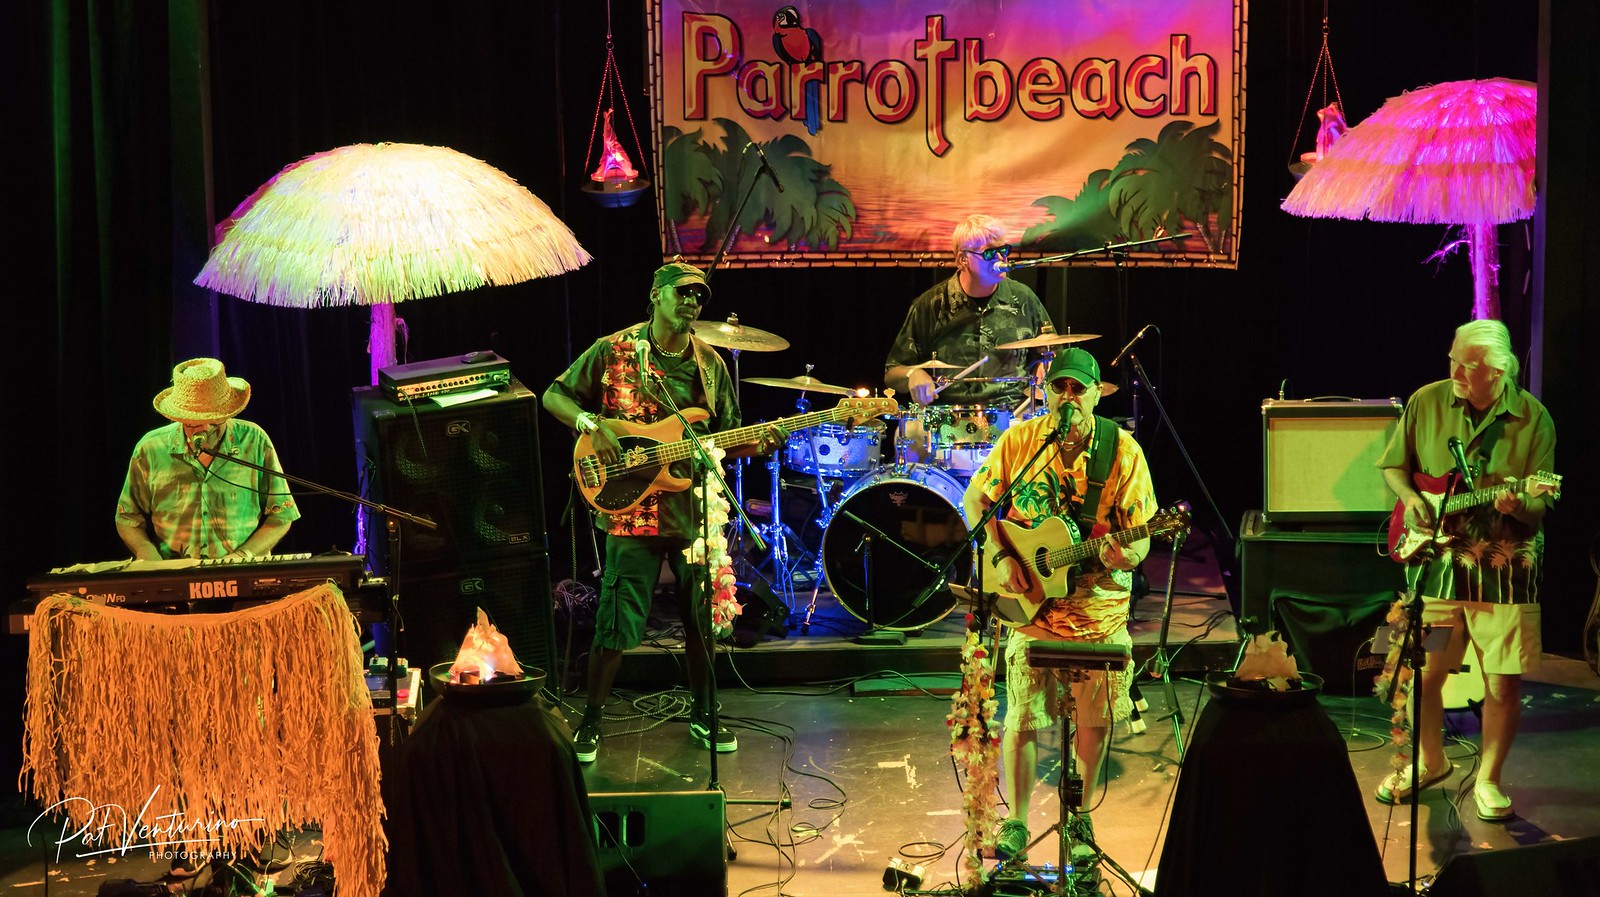 Parrotbeach - Jimmy Buffett Tribute